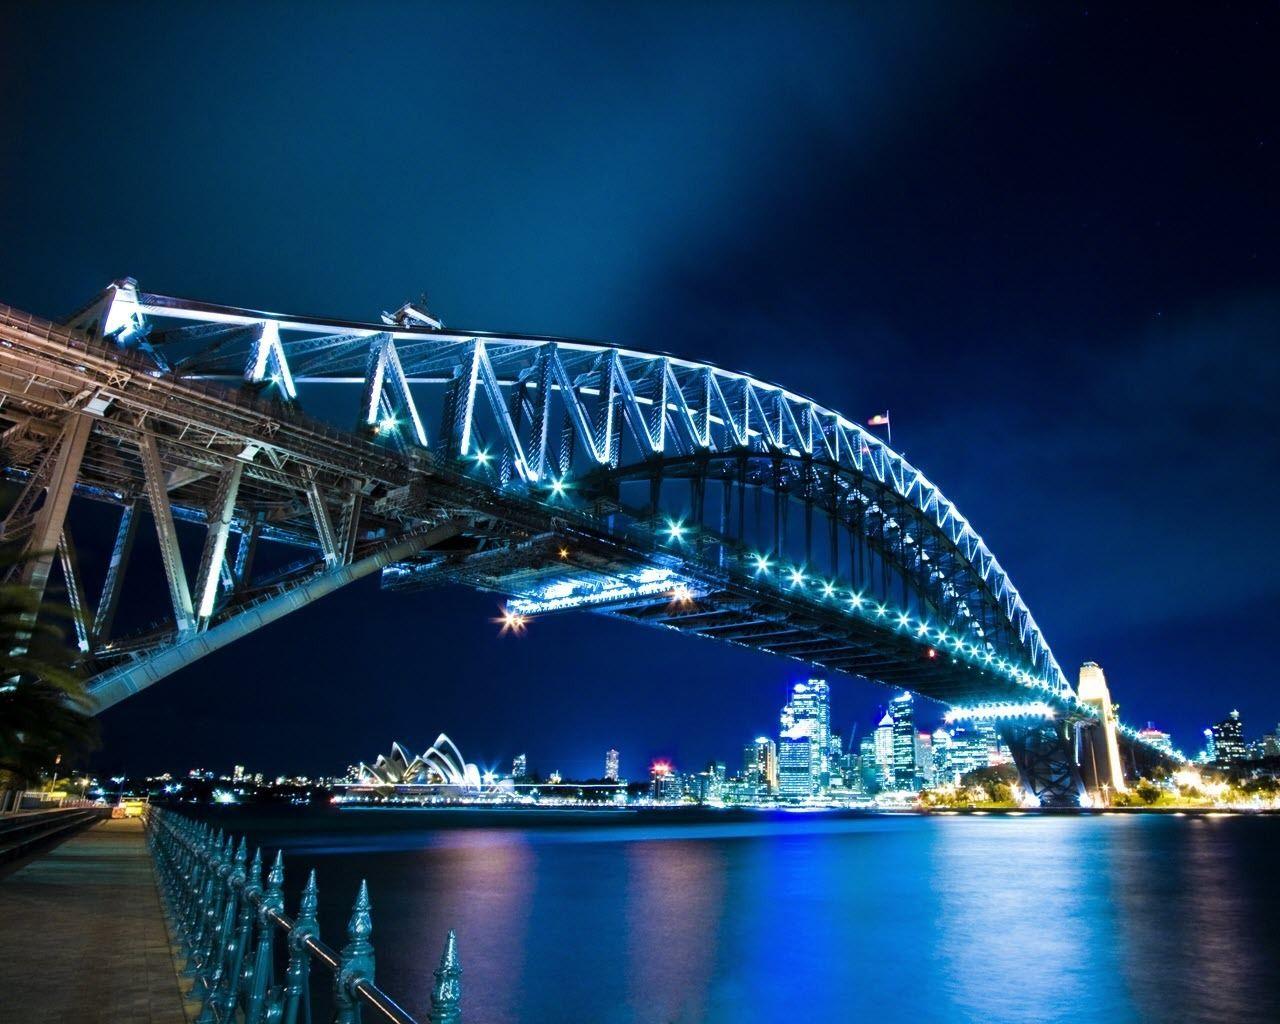 Sydney - Harbour Bridge - australia Wallpaper